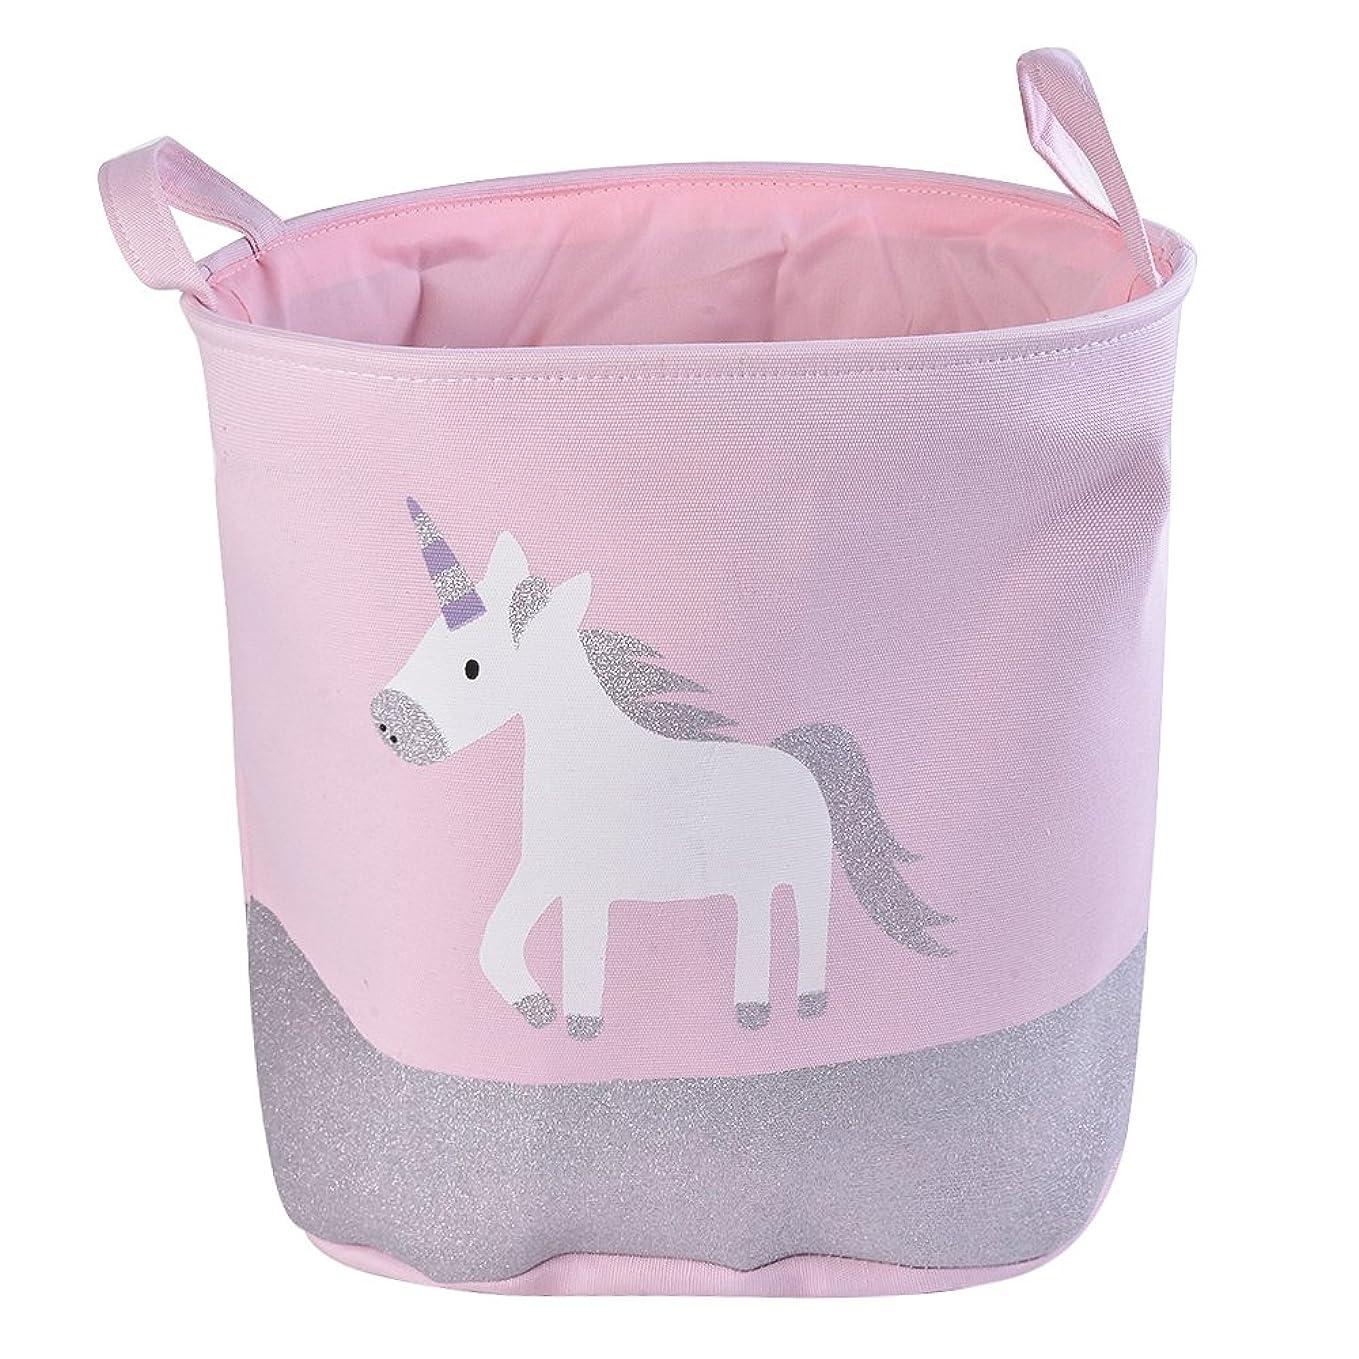 "Urijk Unicorn Toy Storage Basket, Baby Hamper Kid Girl Laundry Basket Nursery Hamper, Waterproof Cute Cartoon Round Canvas Foldable Toy Organizer for Office Bedroom Dorm, Dia 13"" x 16""H gs5525432224156"